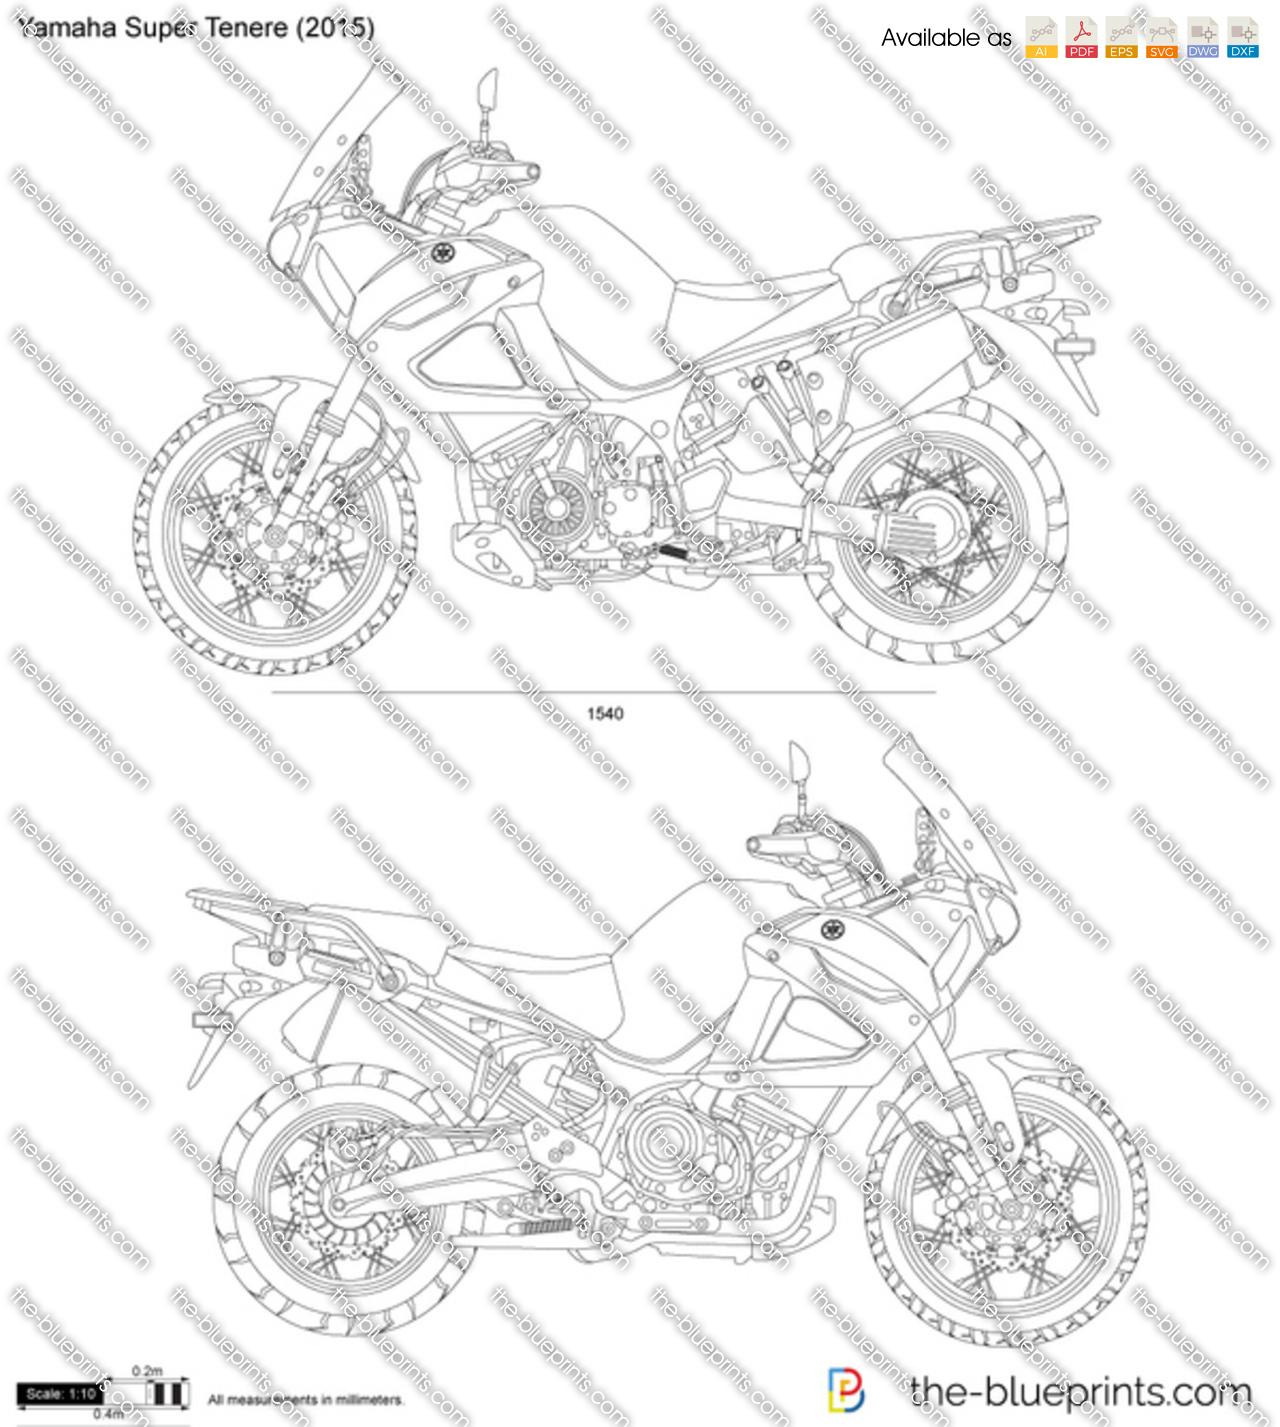 Yamaha Super Tenere vector drawing